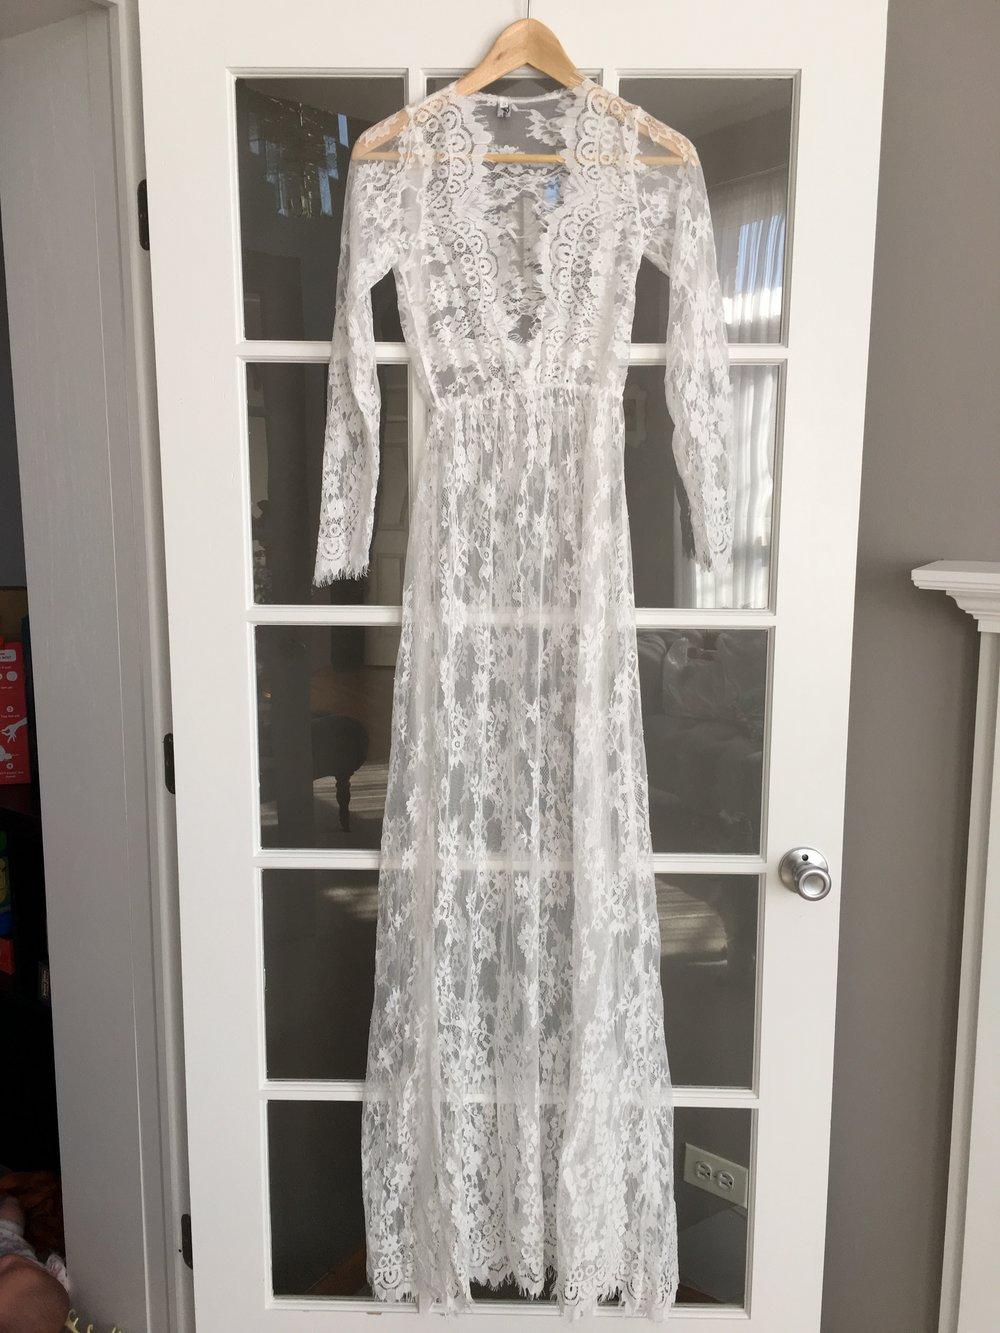 7f0ea7bcee8e6 White Lace Maternity Pregnancy Dress For Photoshoot Milk Bath Dress — SKAIRA